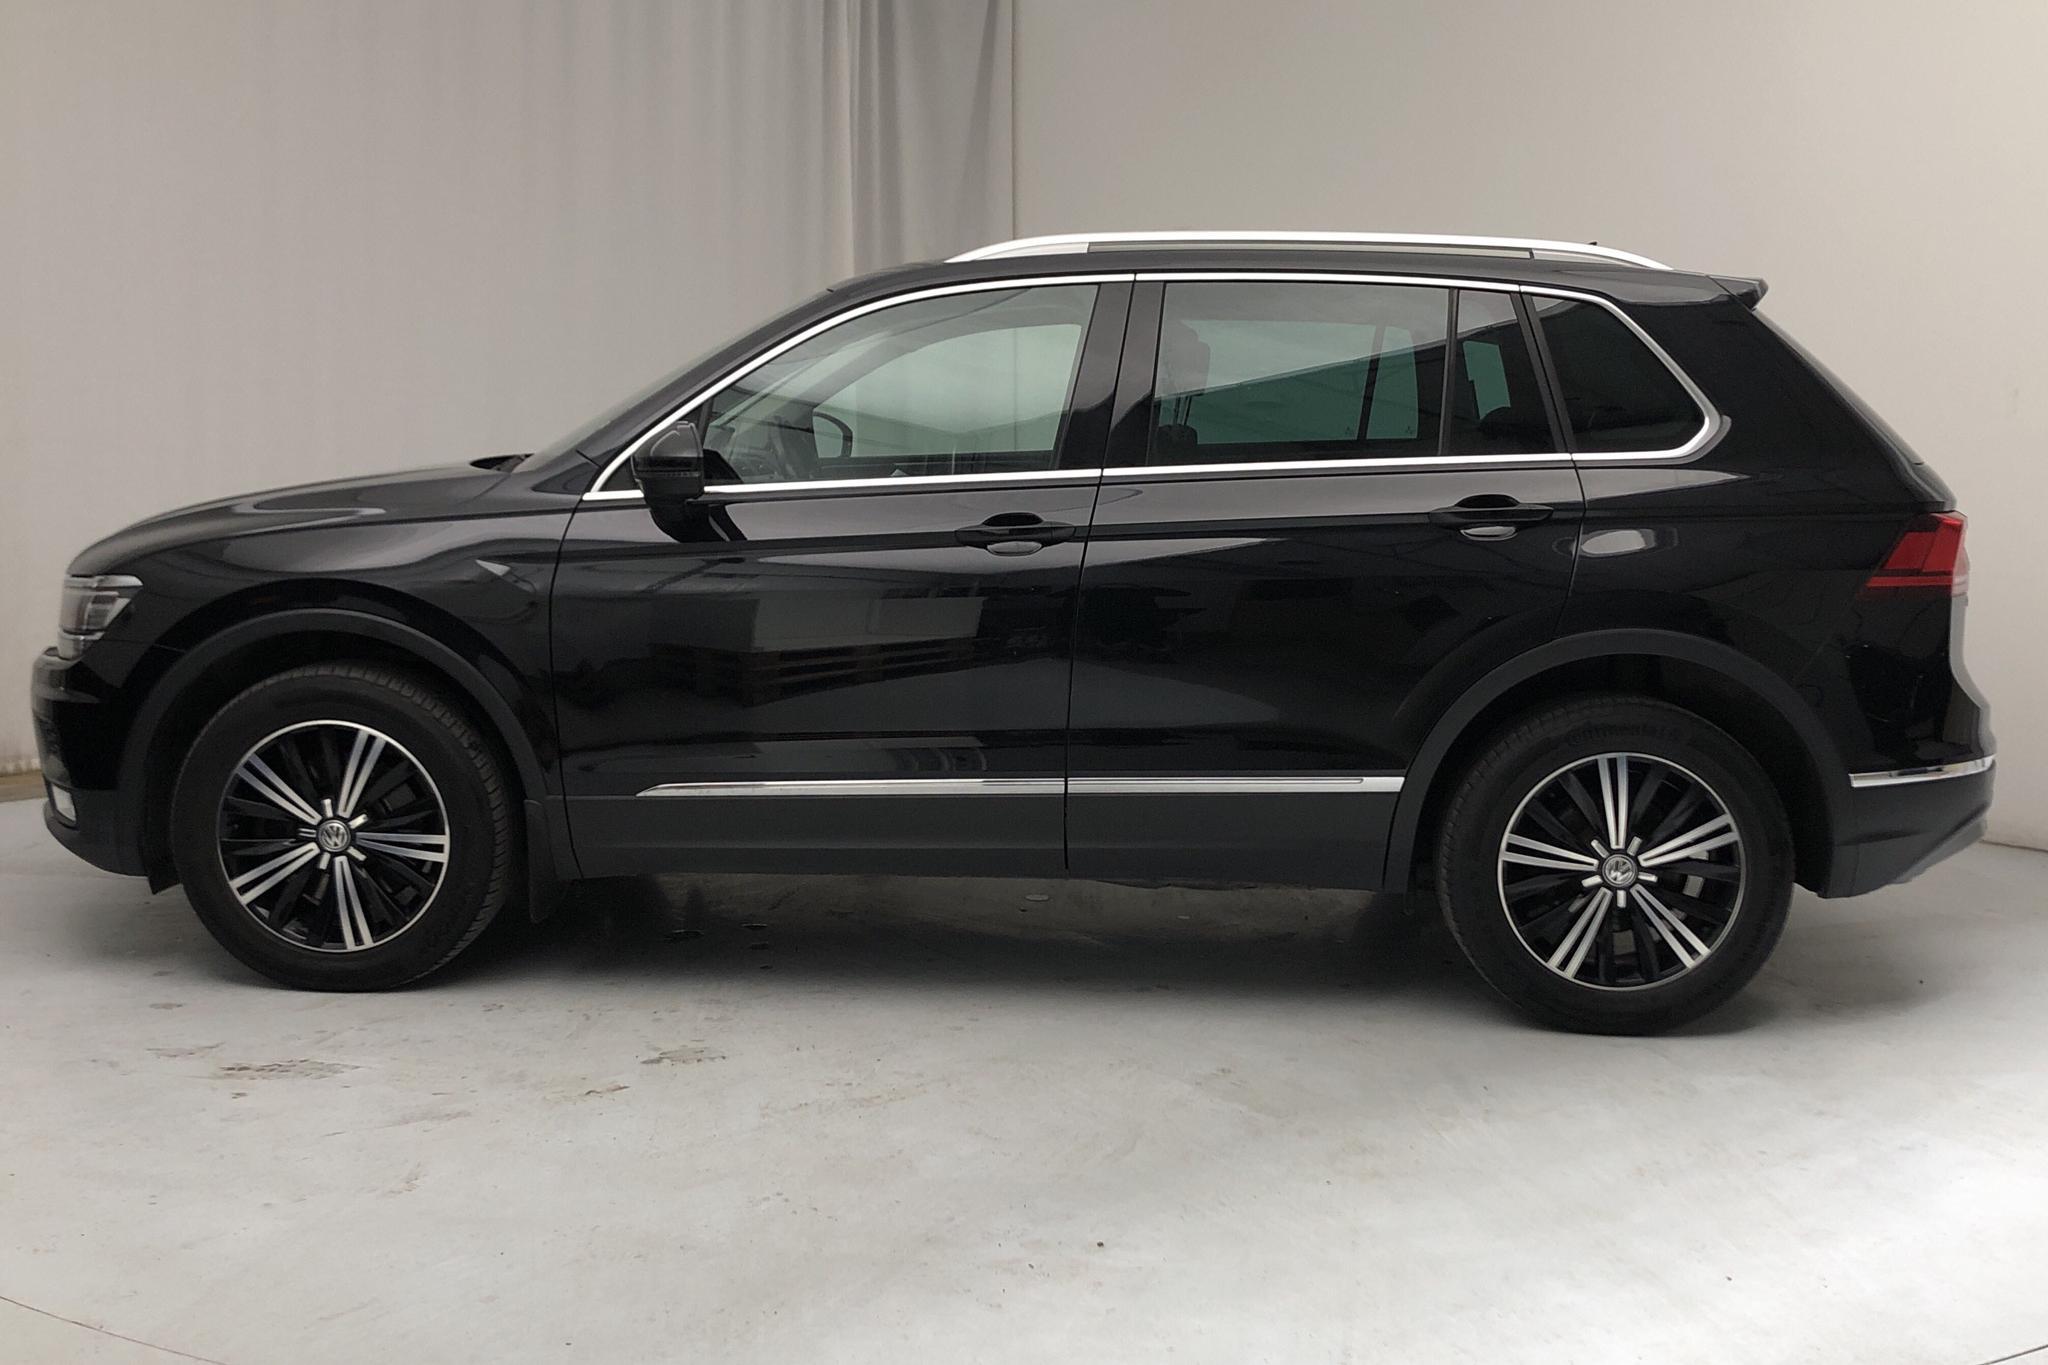 VW Tiguan 2.0 TDI 4MOTION (190hk) - 9 779 mil - Automat - svart - 2017